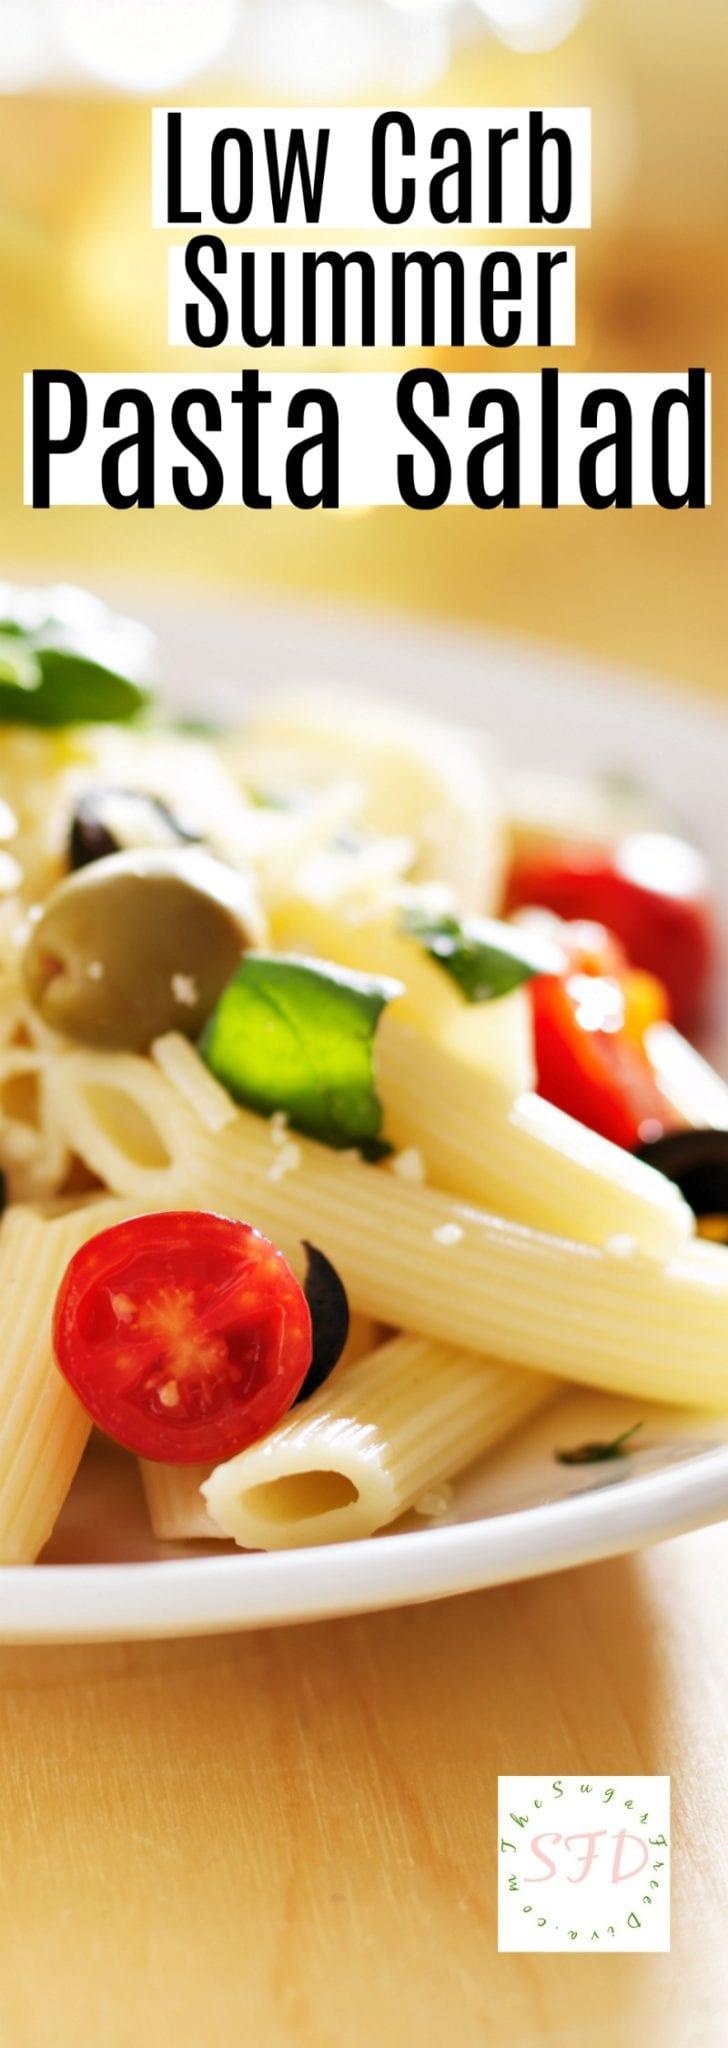 Blue apron low carb - Low Carb Summer Pasta Salad